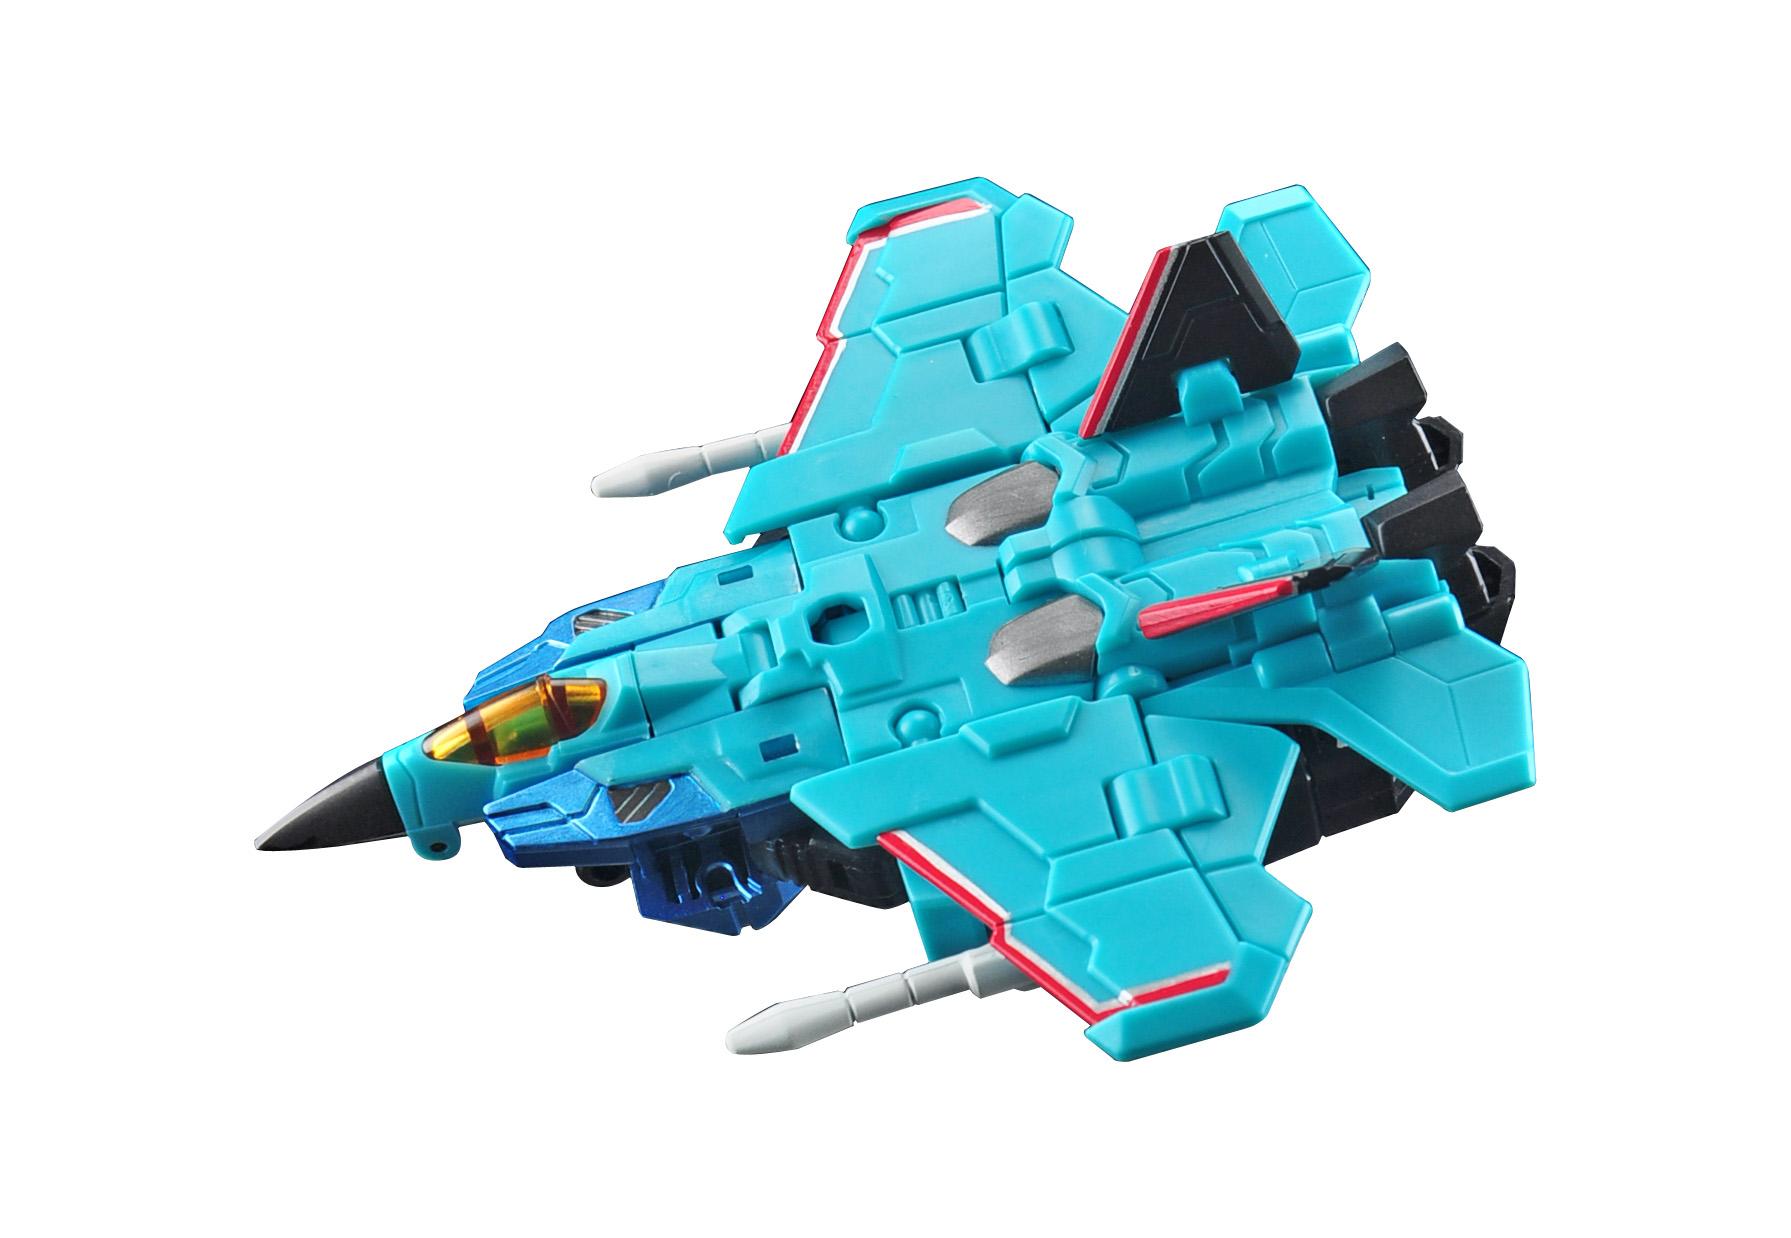 Transformers IronFactory IF EX-20K Kallaite in Stock